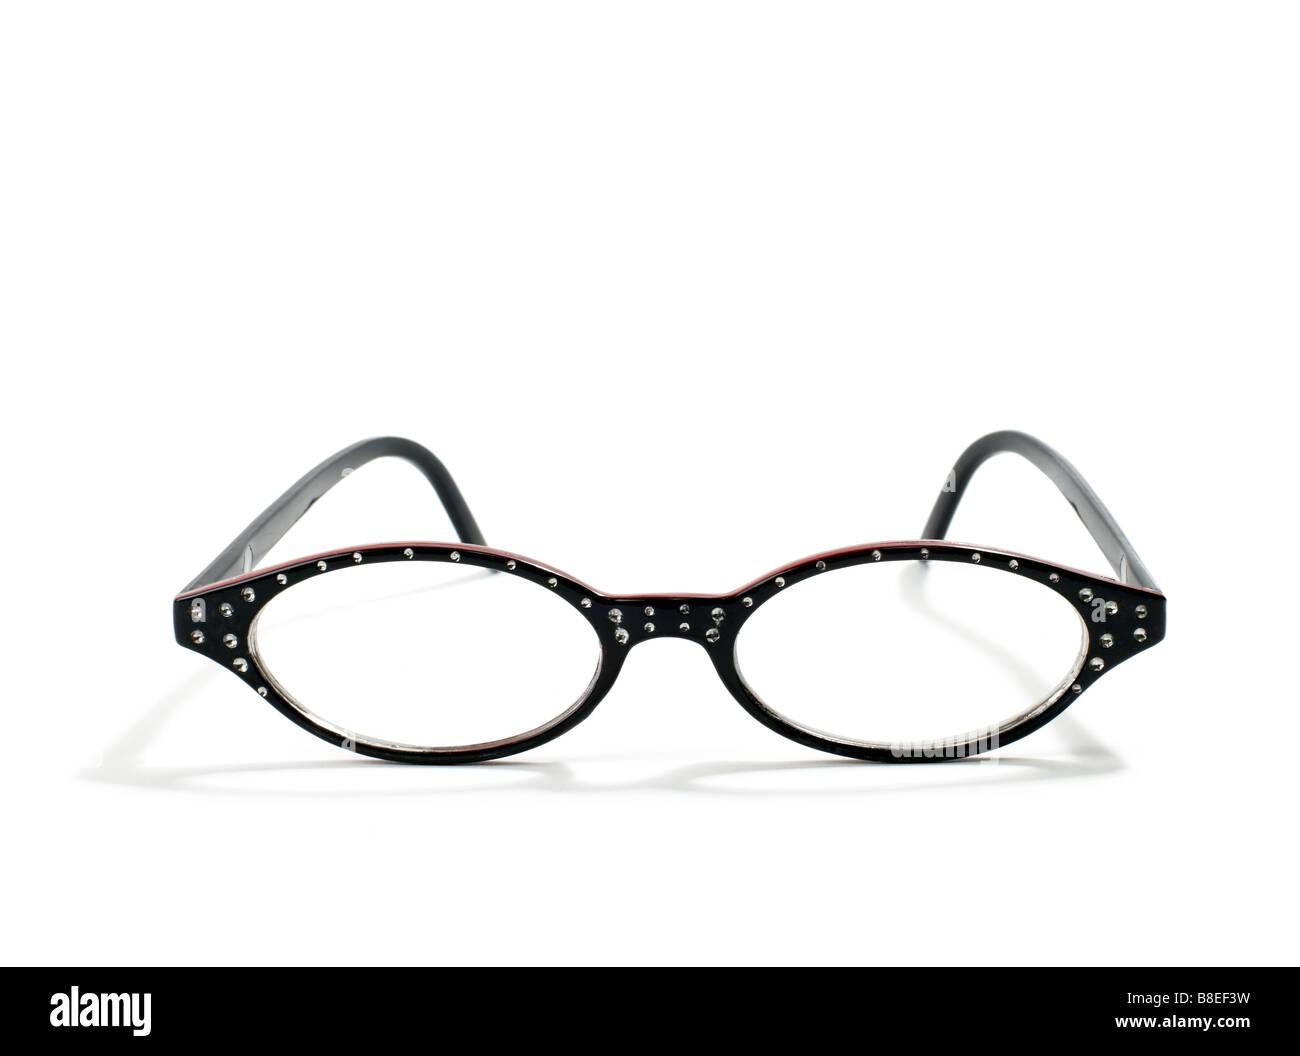 Women's fashion eyeglasses - Stock Image